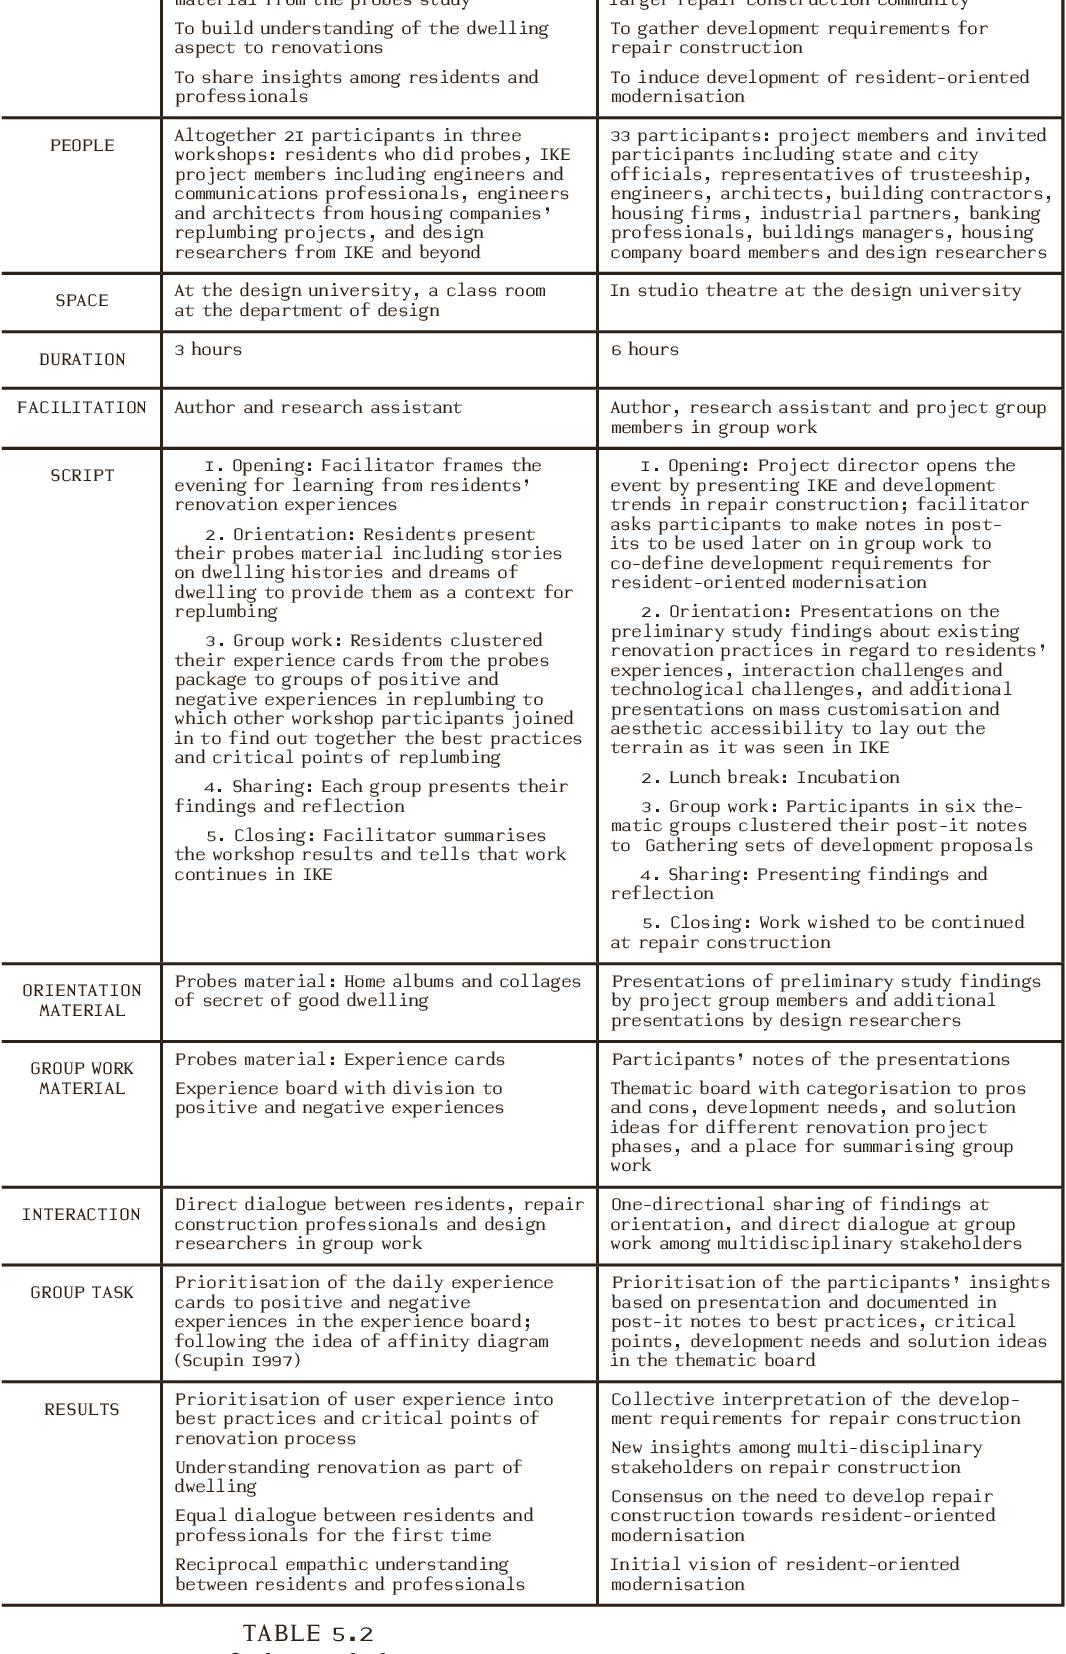 PDF] Facilitating change : towards resident-oriented housing